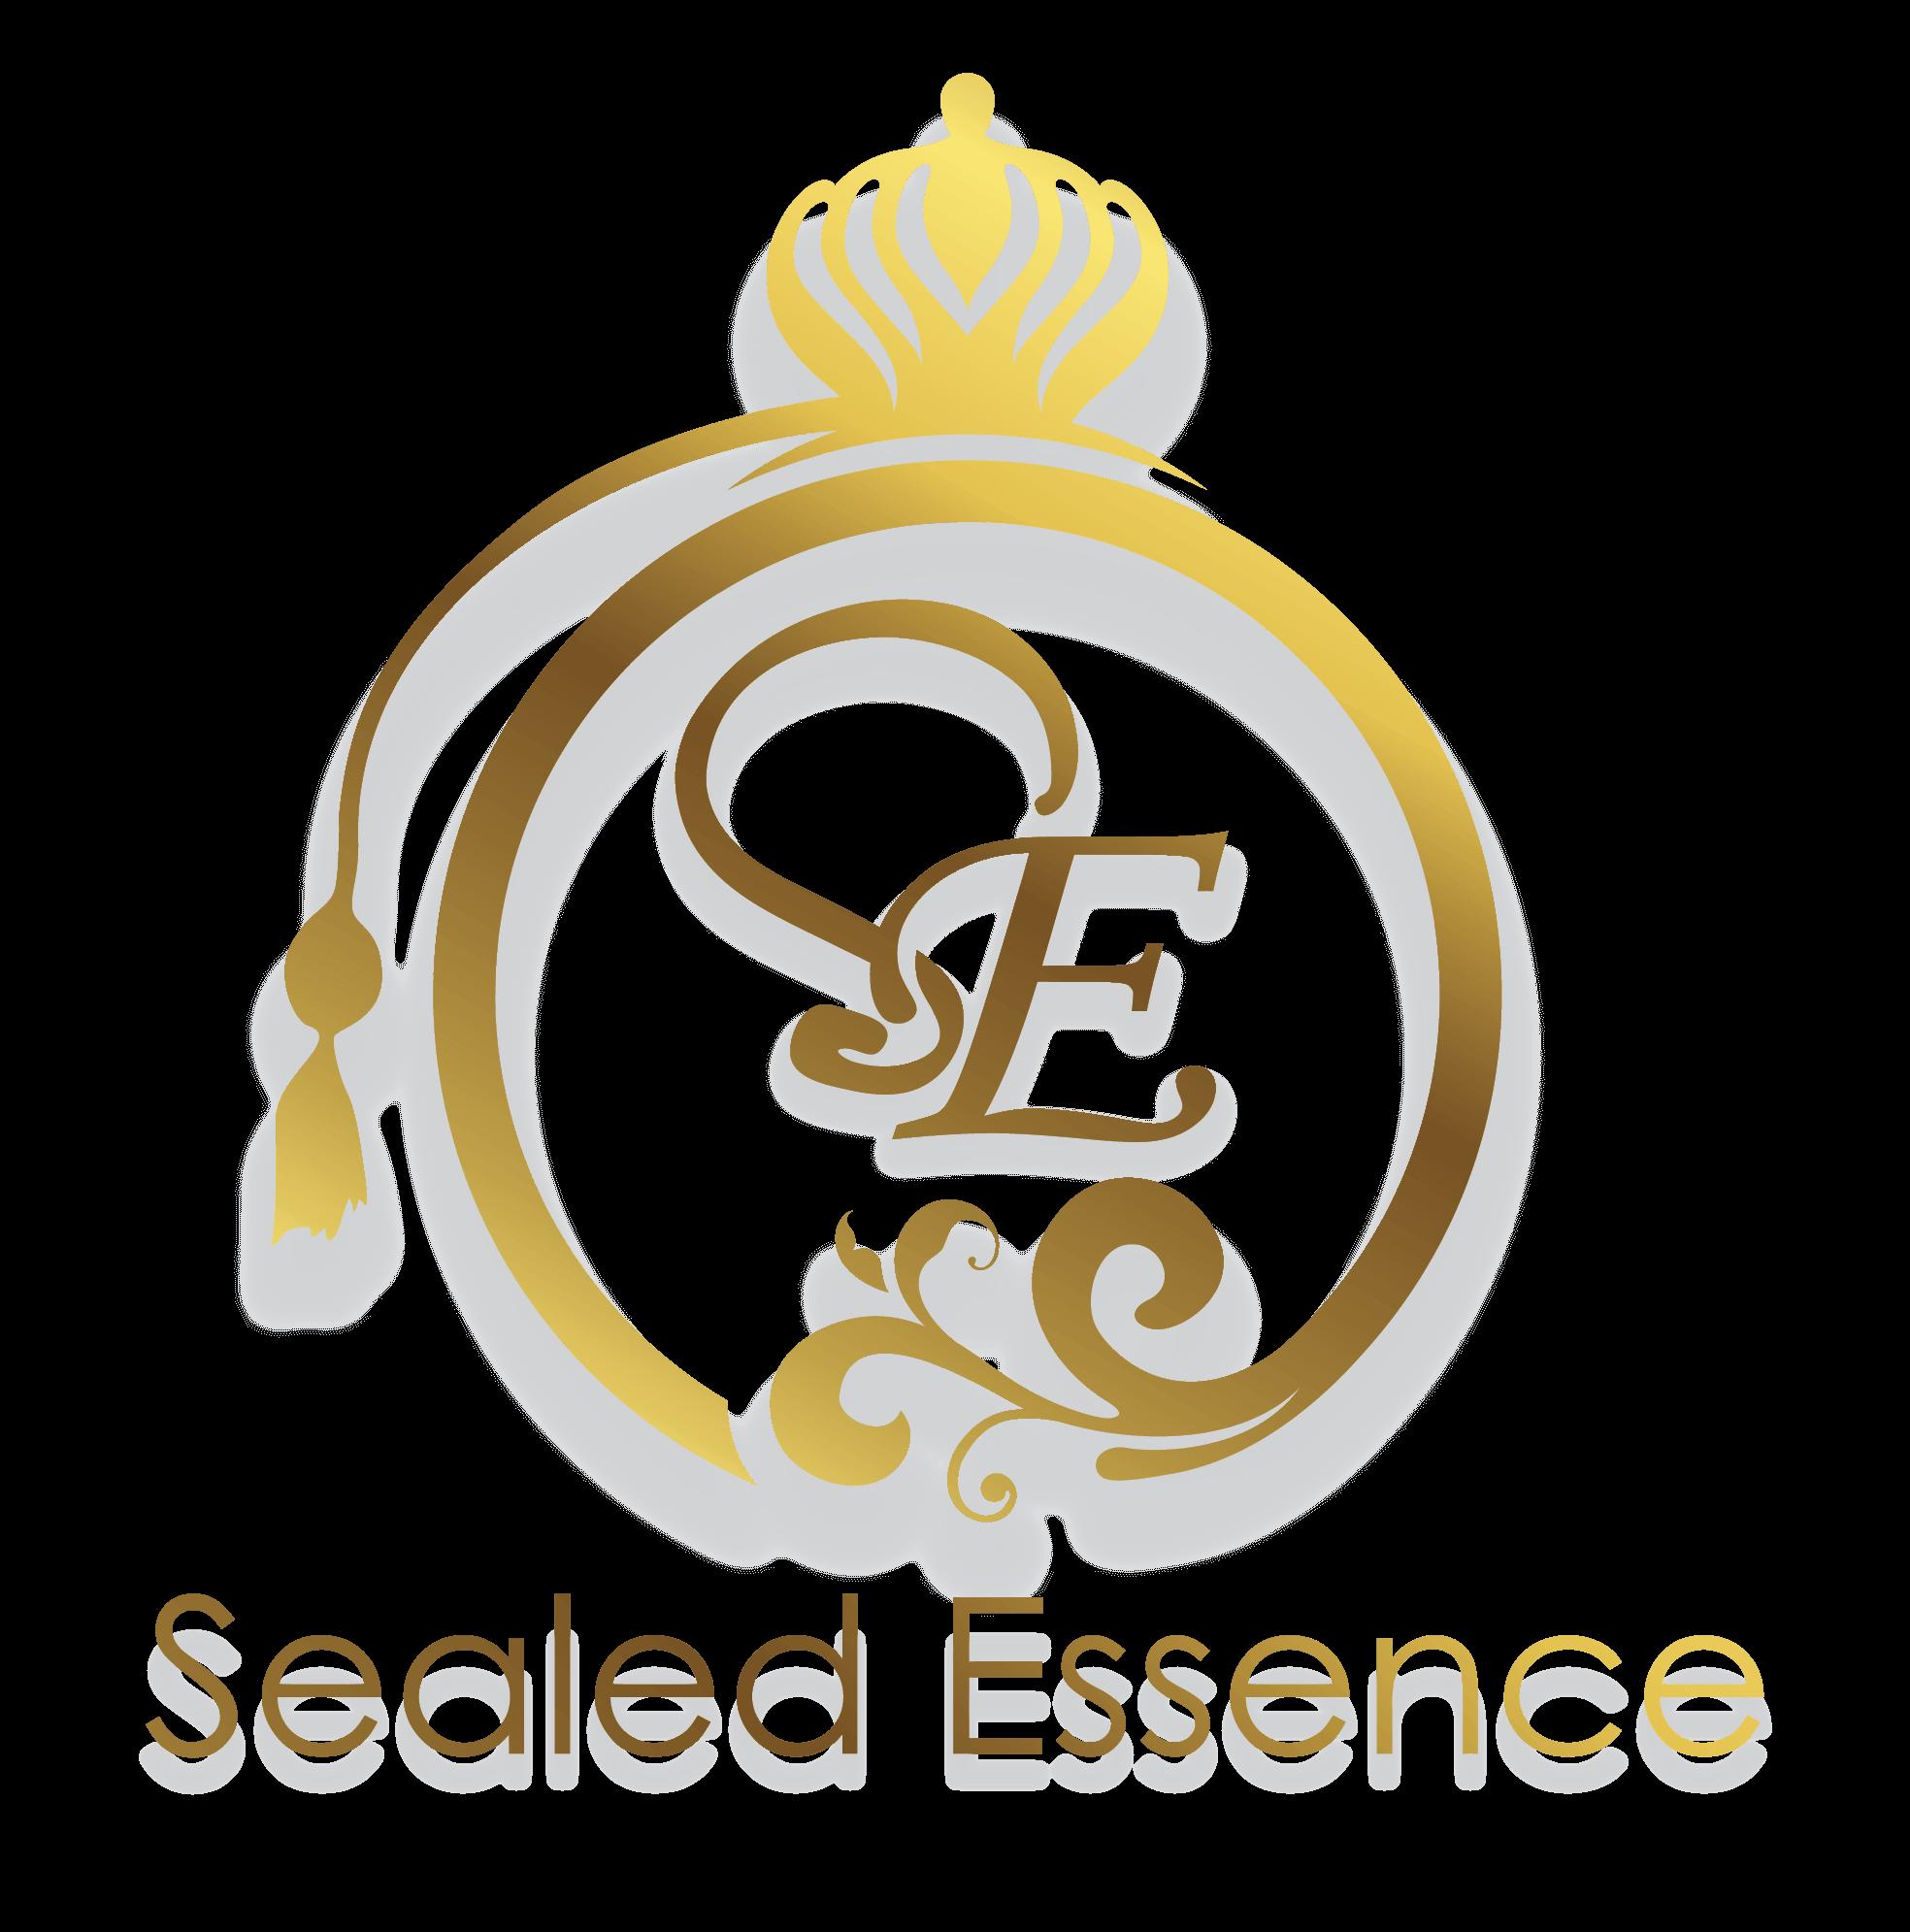 Sealed Essence